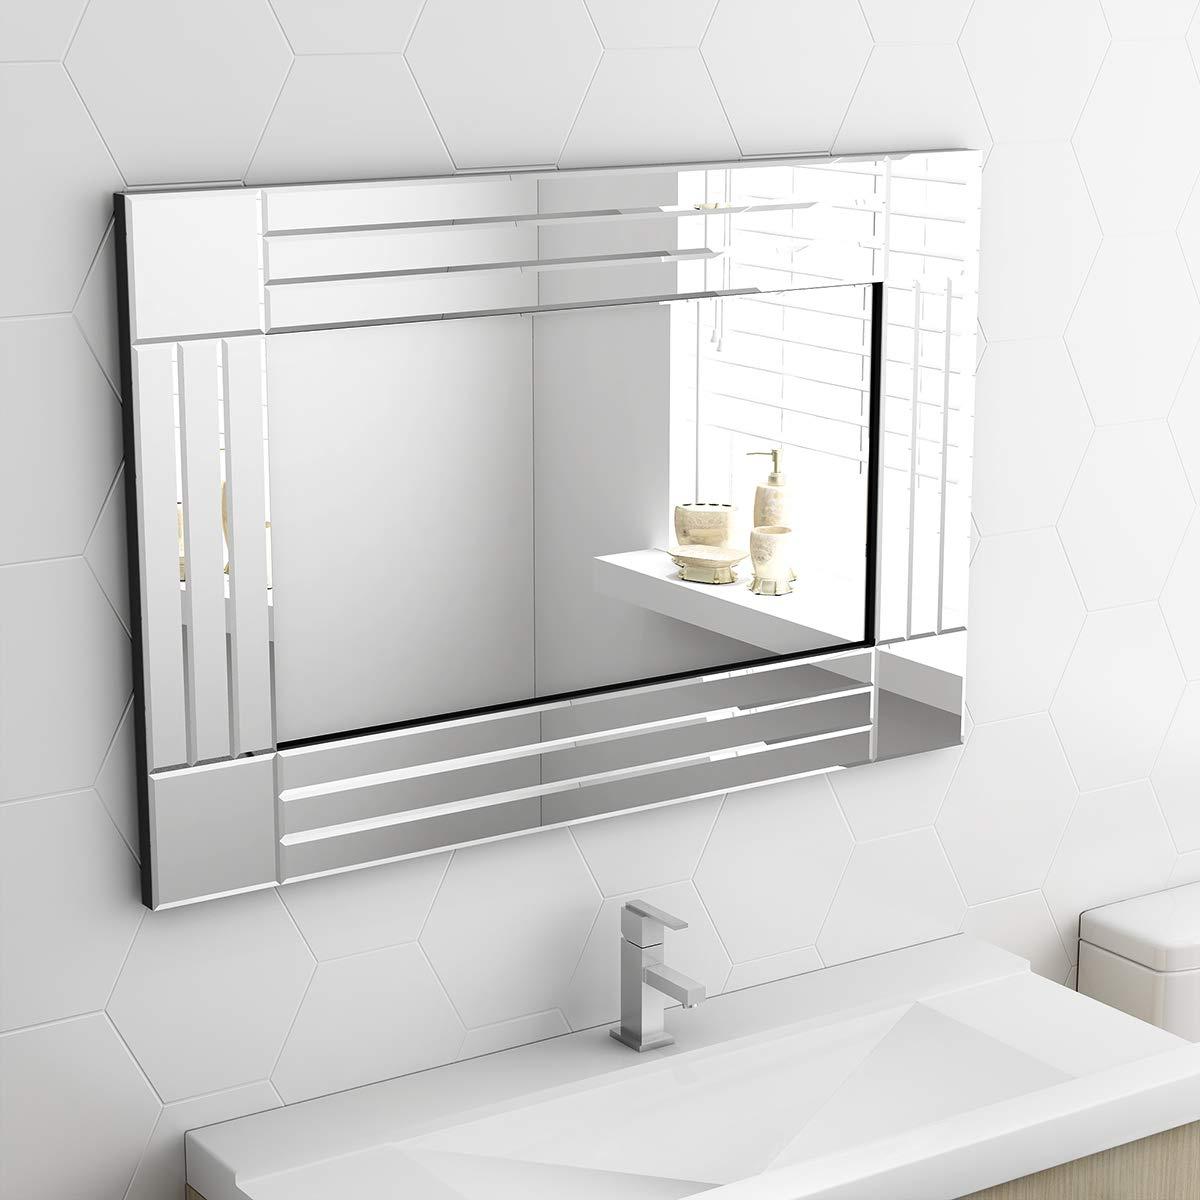 2020 Paldin Wall Hung Mirrors, Modern Wall Hung Bathroom Mirrors Large With Large Wall Mirrors For Bathroom (View 1 of 20)